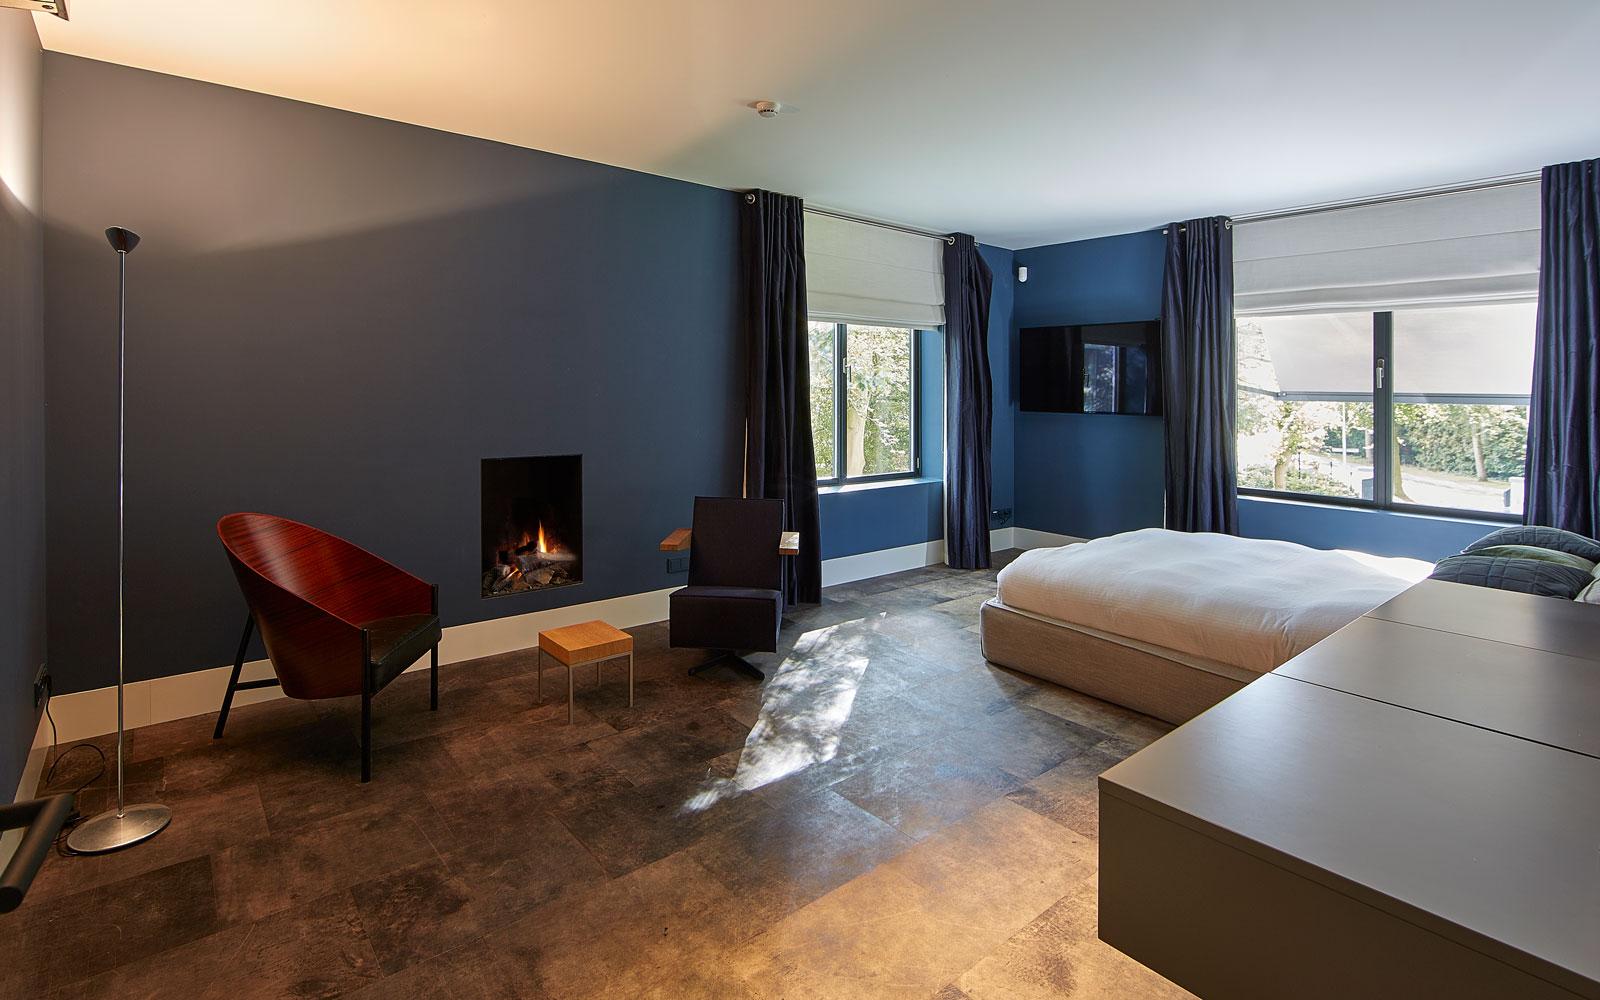 Bovenverdieping, slaapkamer, vloer, leer, Alphenberg sfeervol, haard, bed, symmetrische villa, PBV Architects